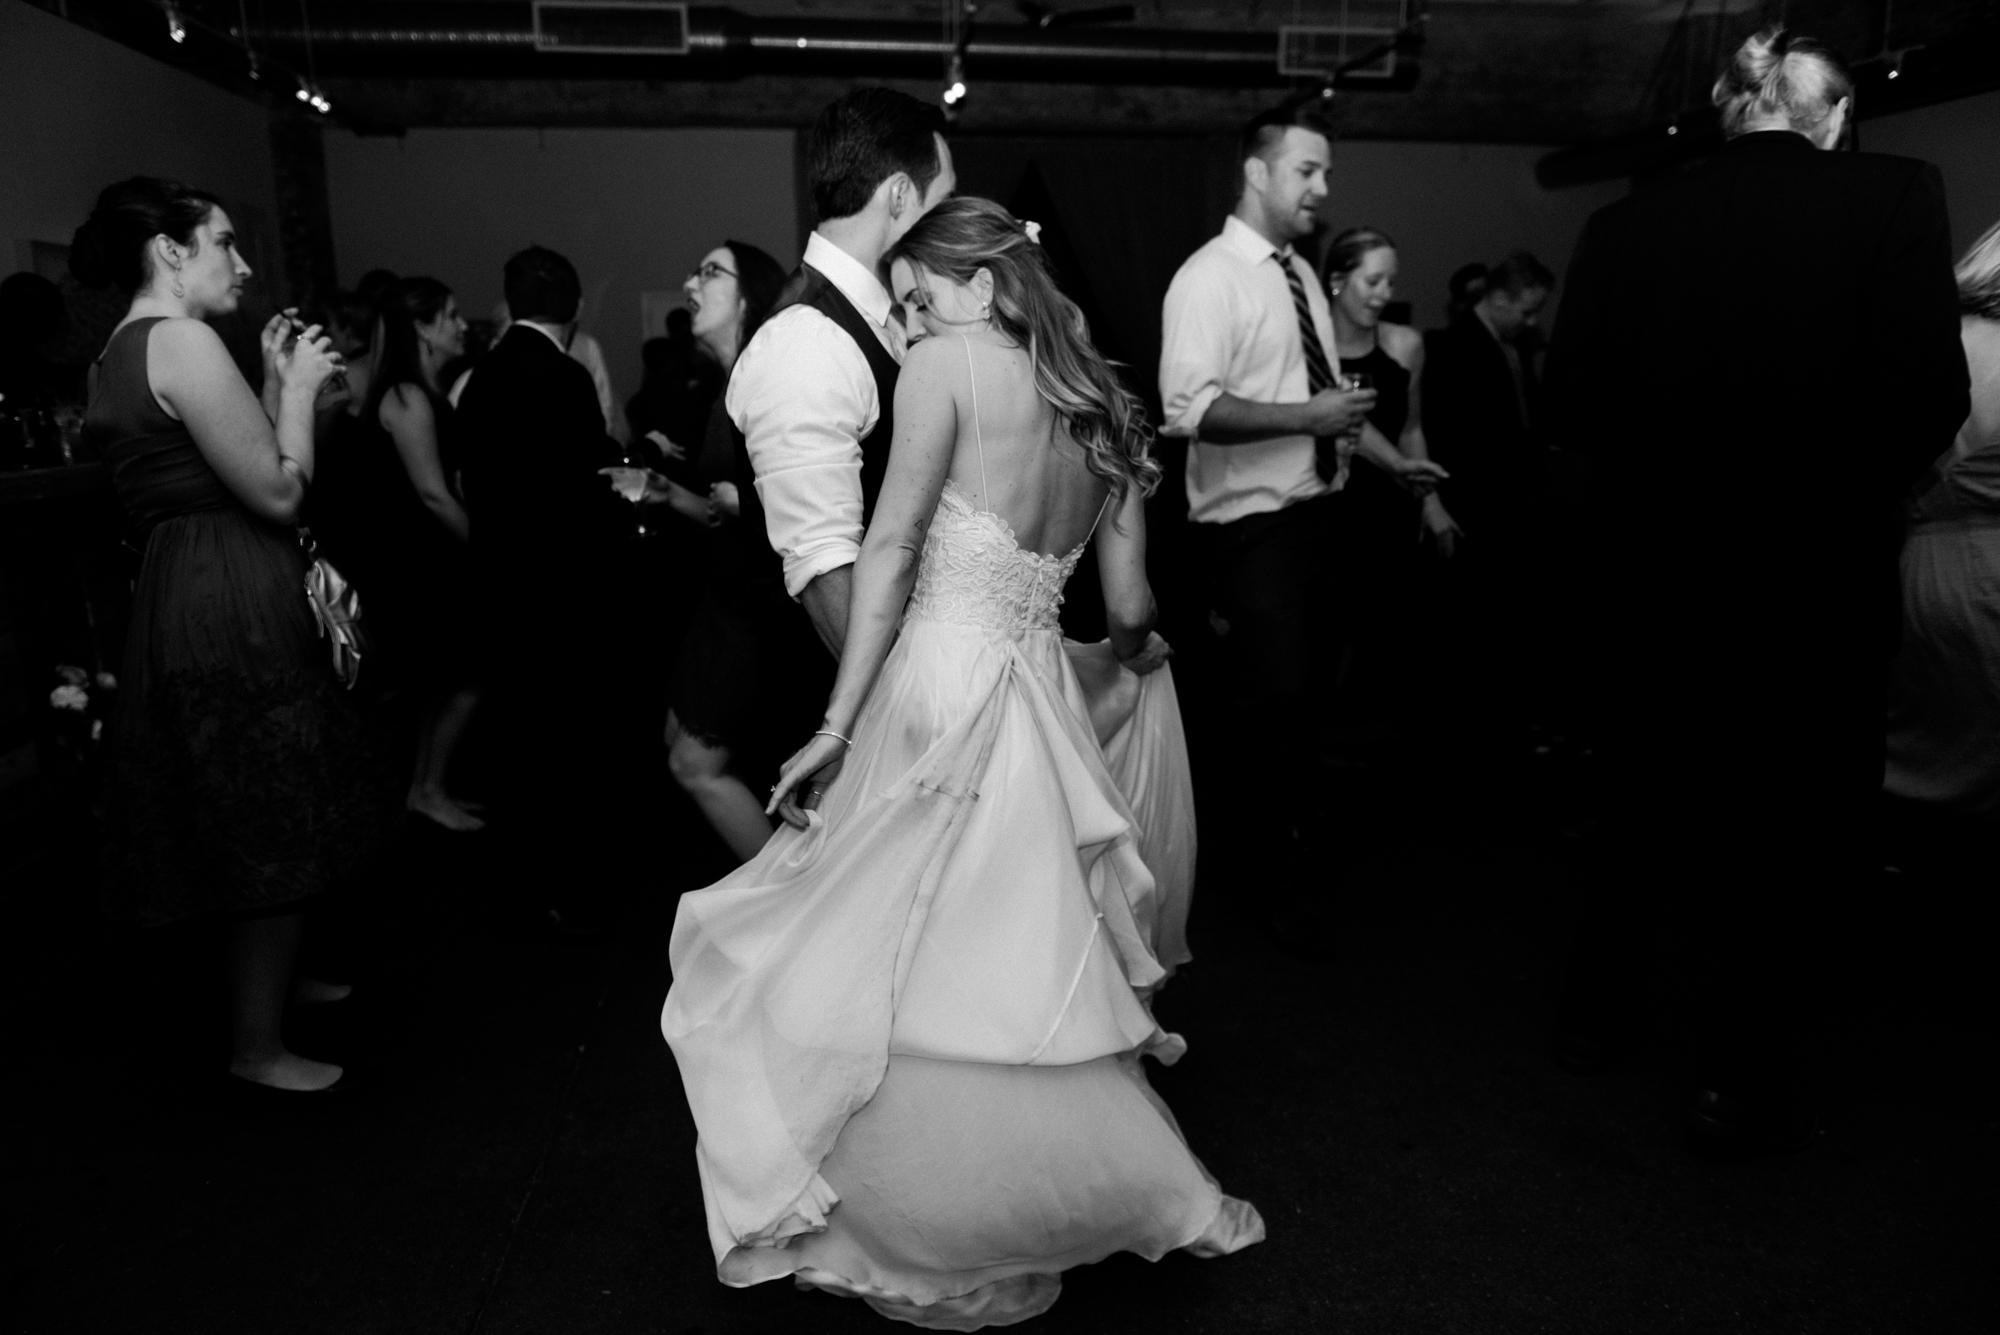 LongView-Gallery-Wedding-Art-Washington-DC-Film-Photographer-58.jpg